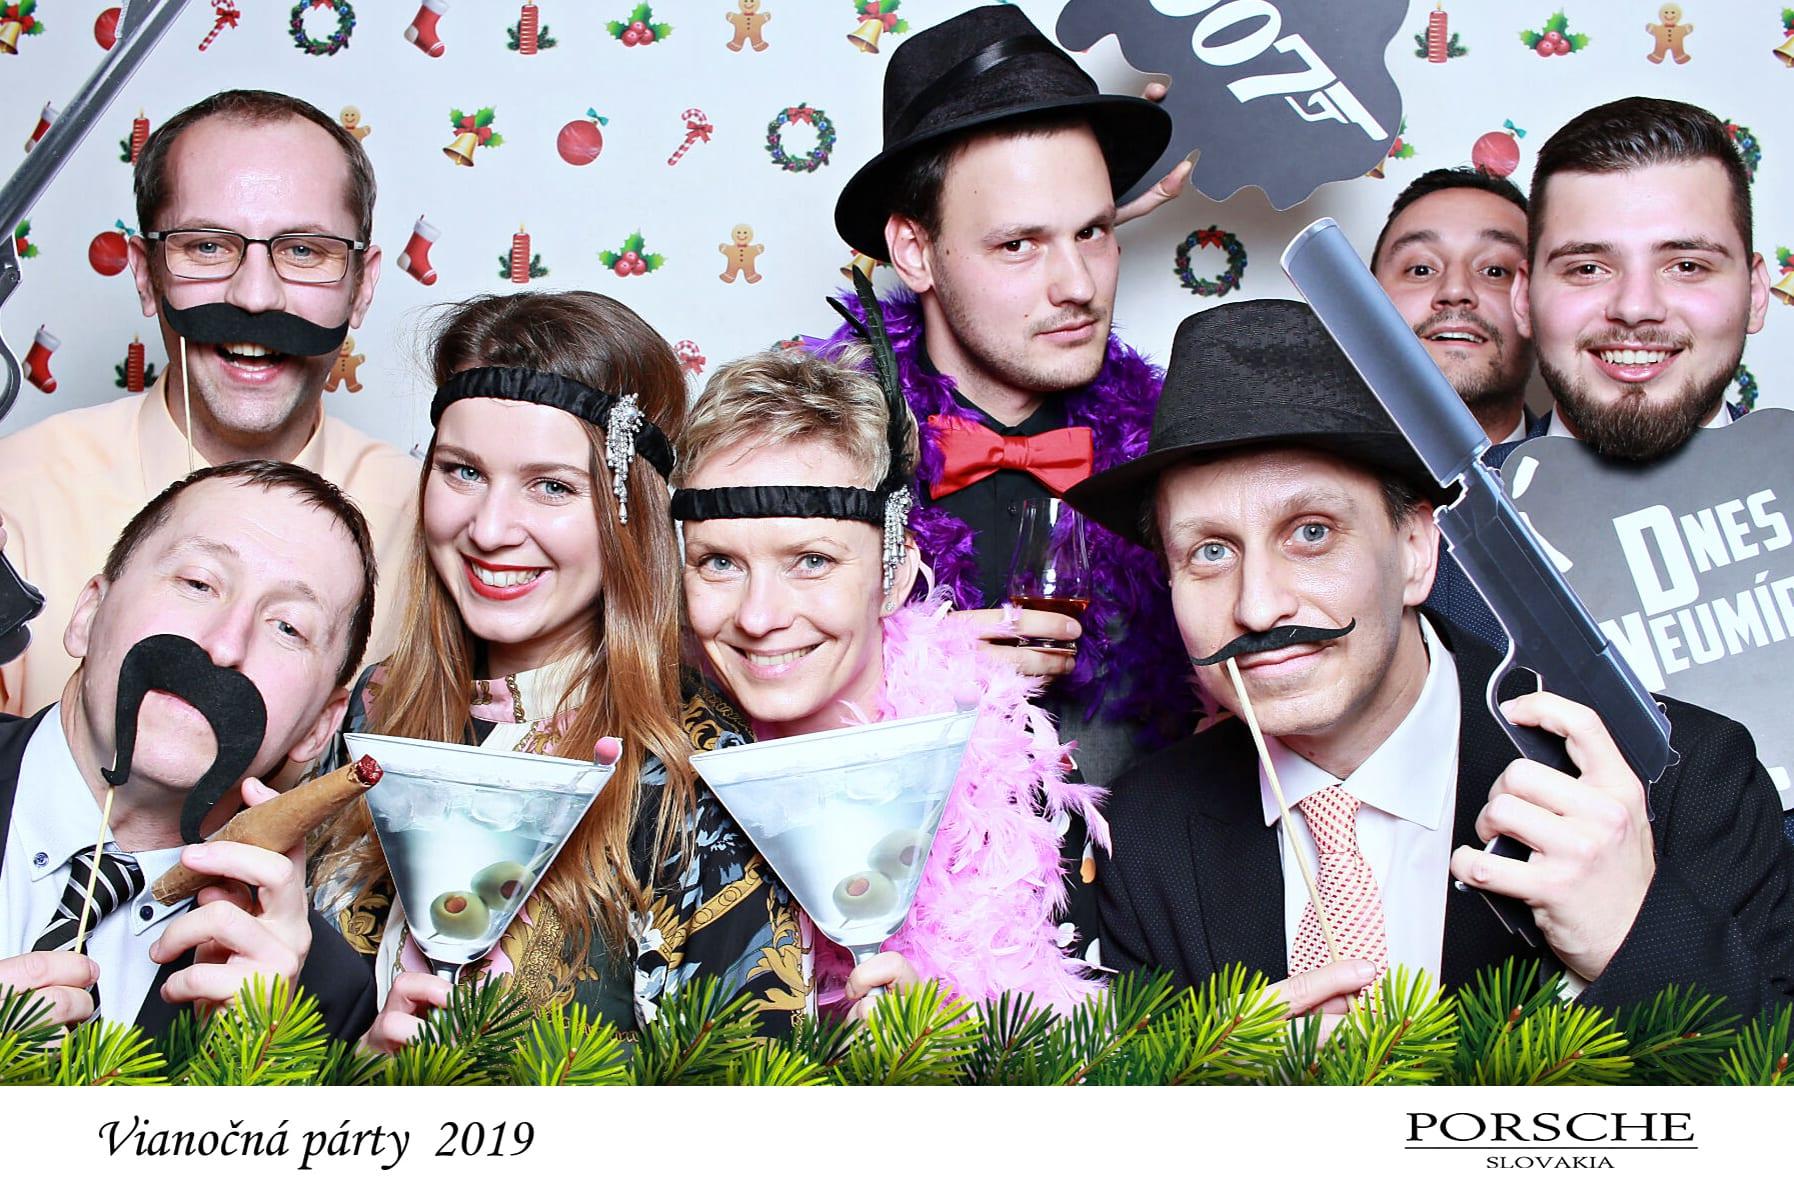 fotokoutek-bratislava-vanocni-vecirek-porsche-slovakia-vianocna-party-12-12-2019-687560